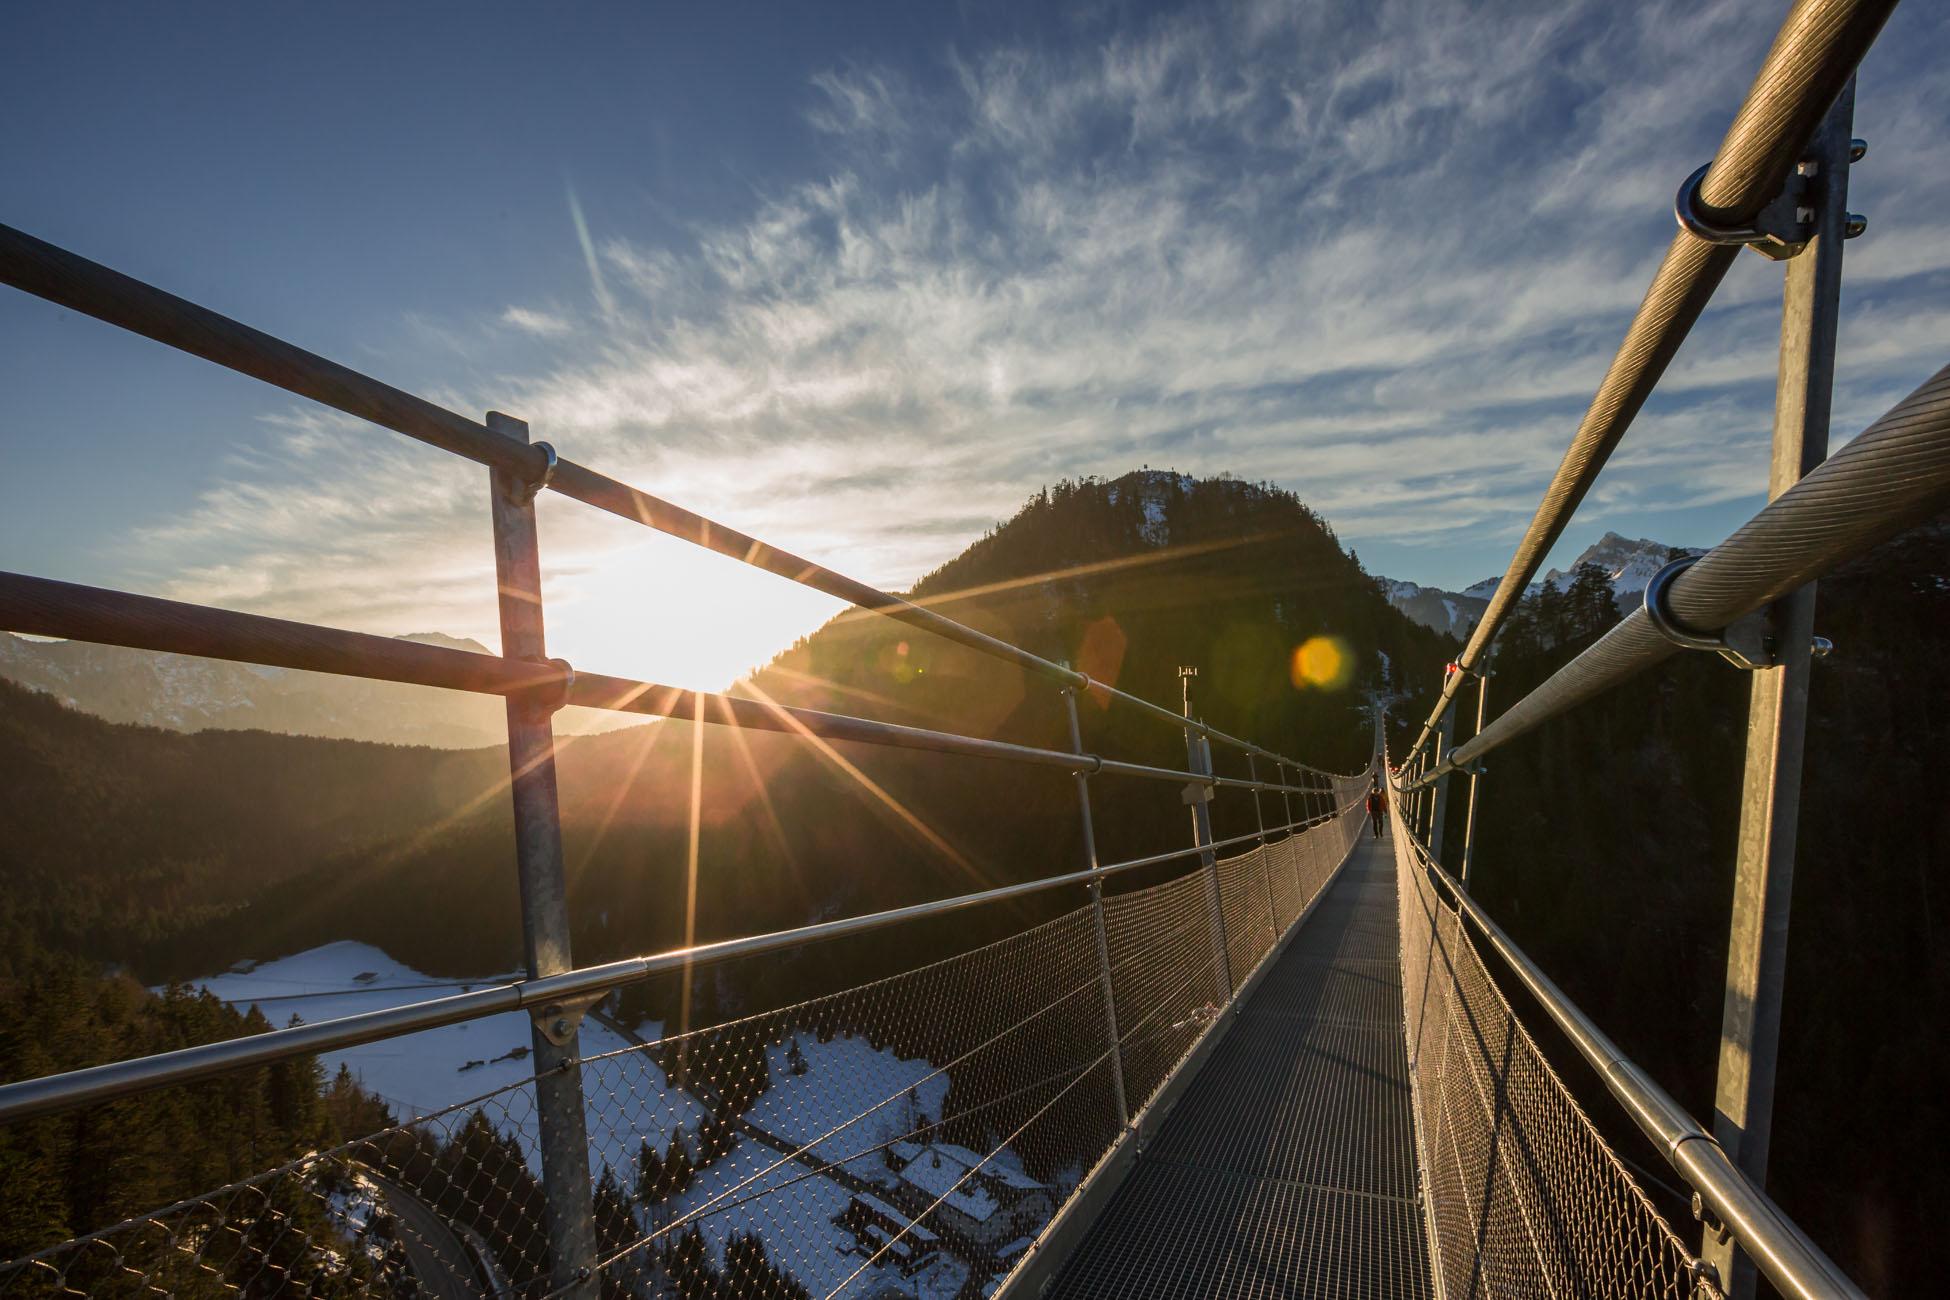 Highline179 Hängebrücke in Reutte